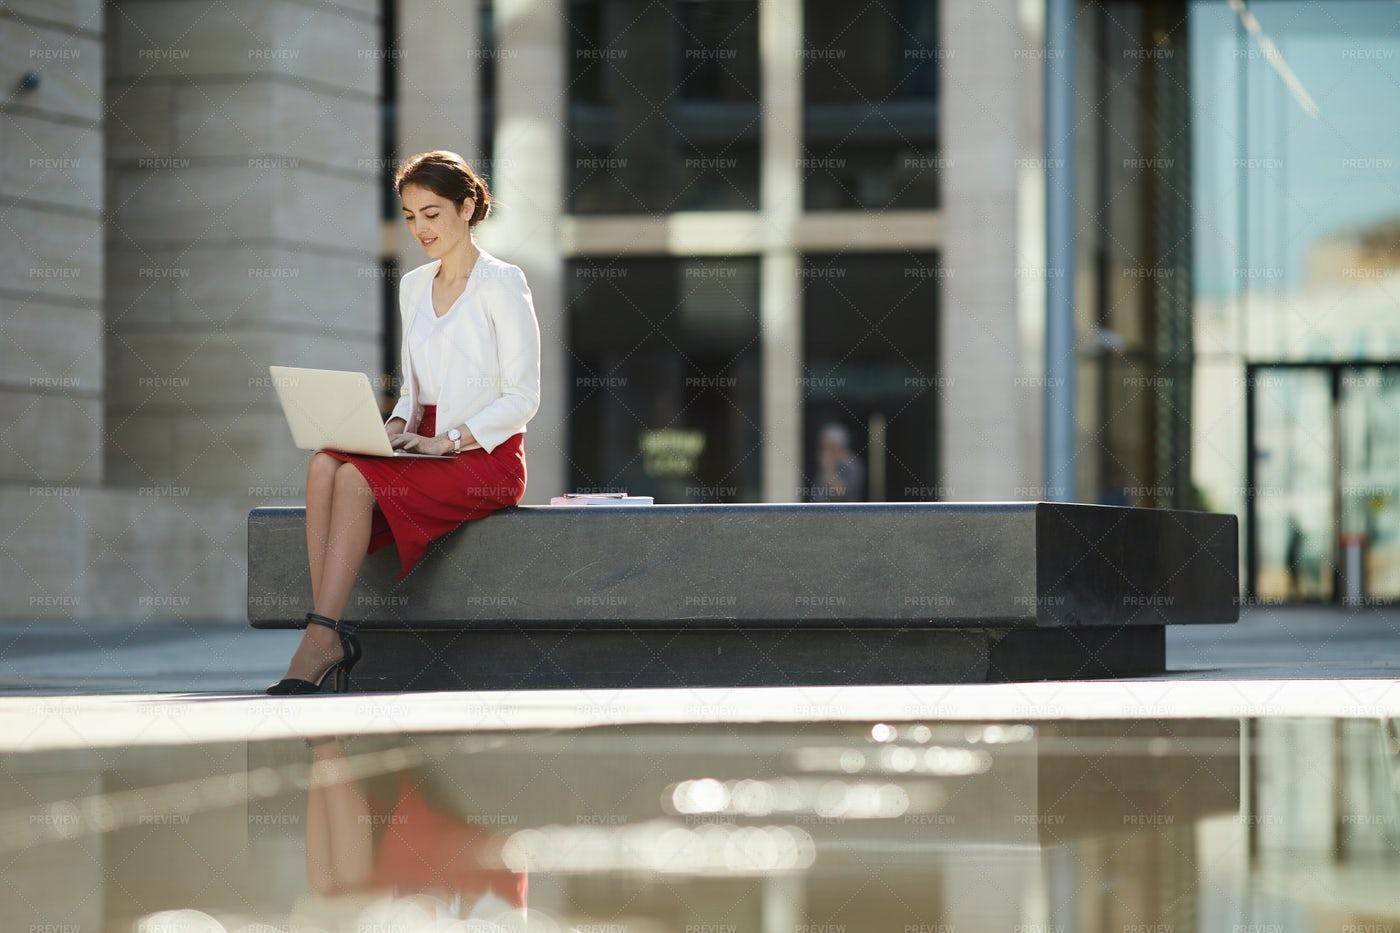 Smiling Businesswoman Working...: Stock Photos